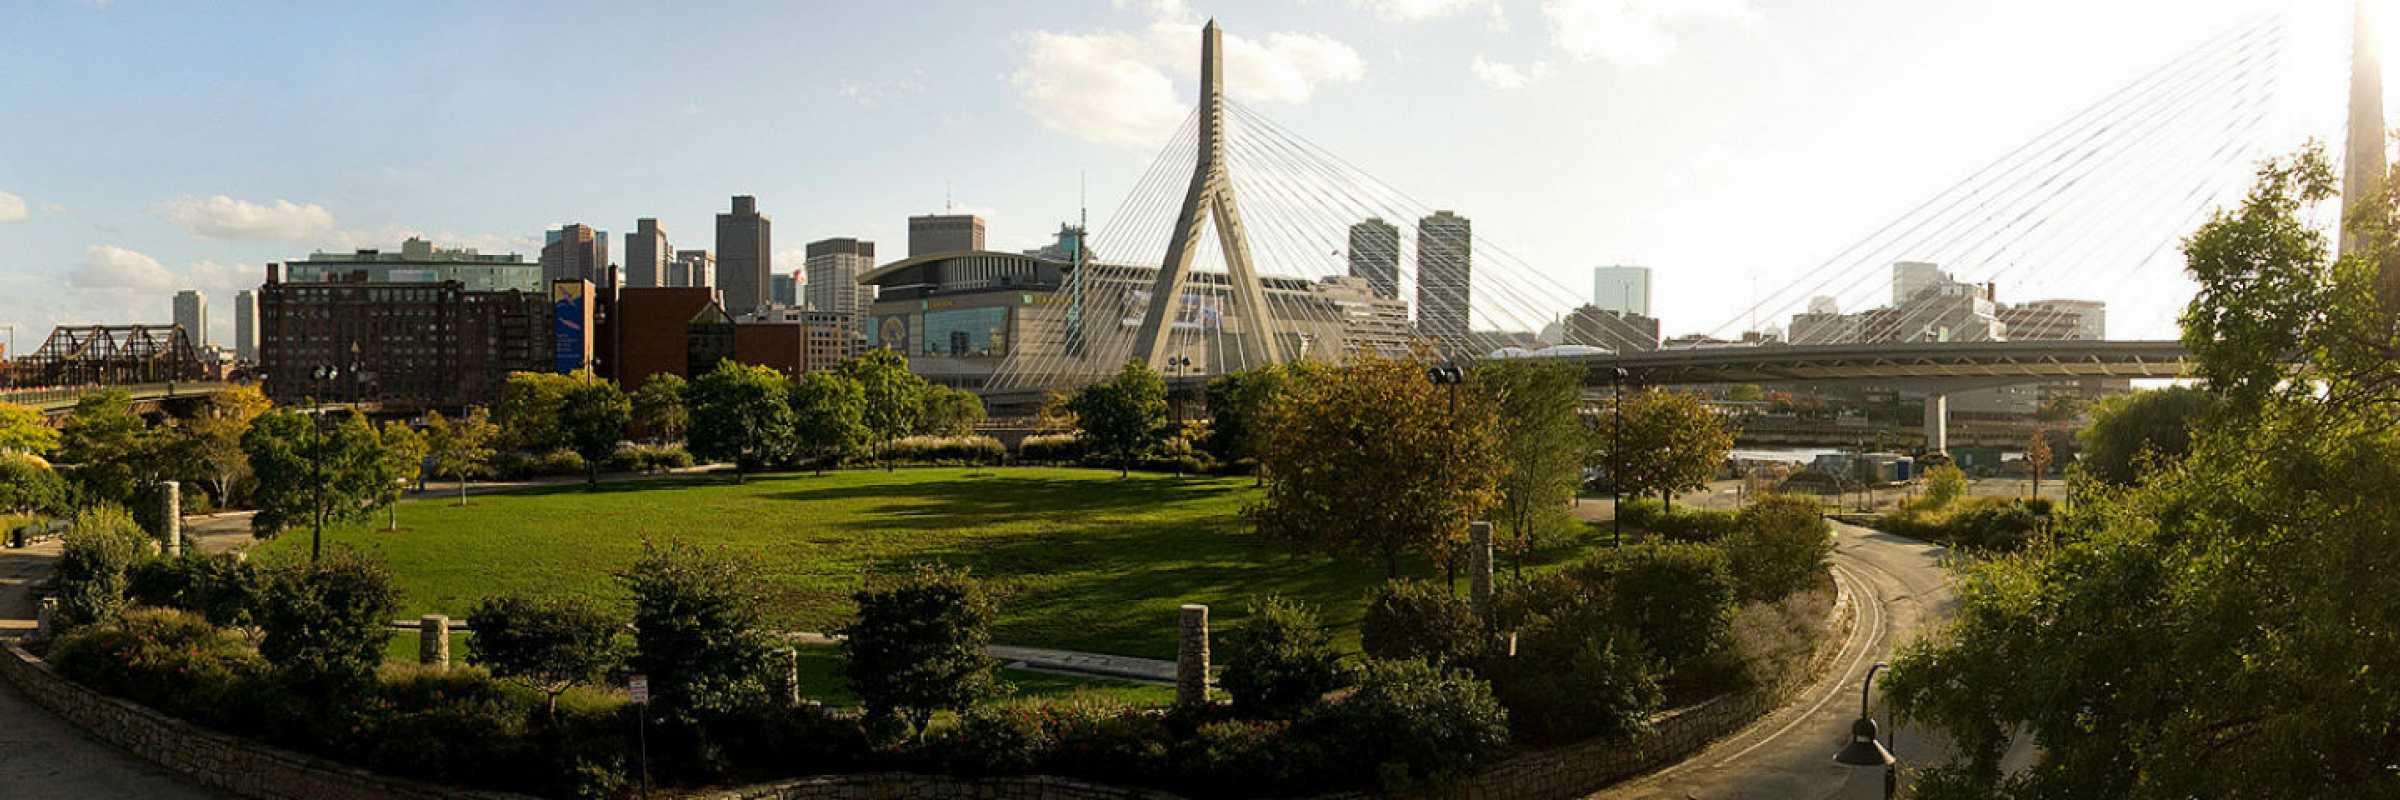 Boston Panorama by Dirk Knight